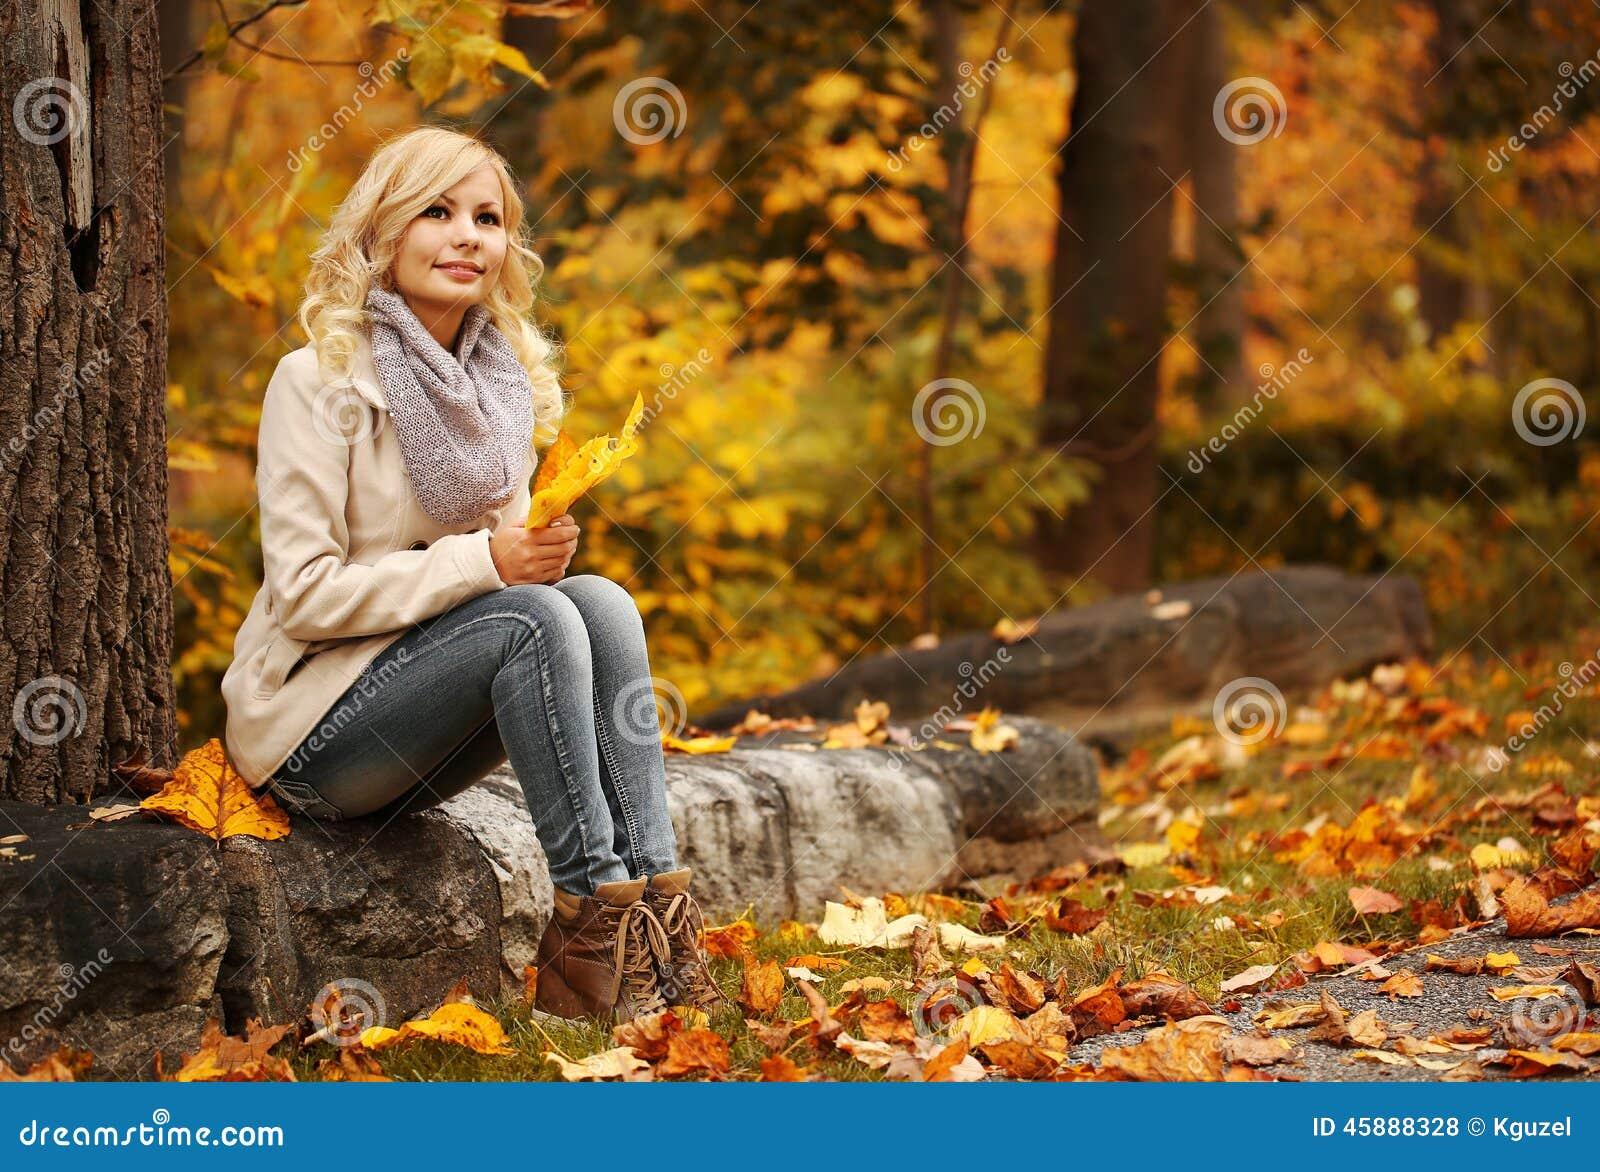 Картинки осень девушка блондинка